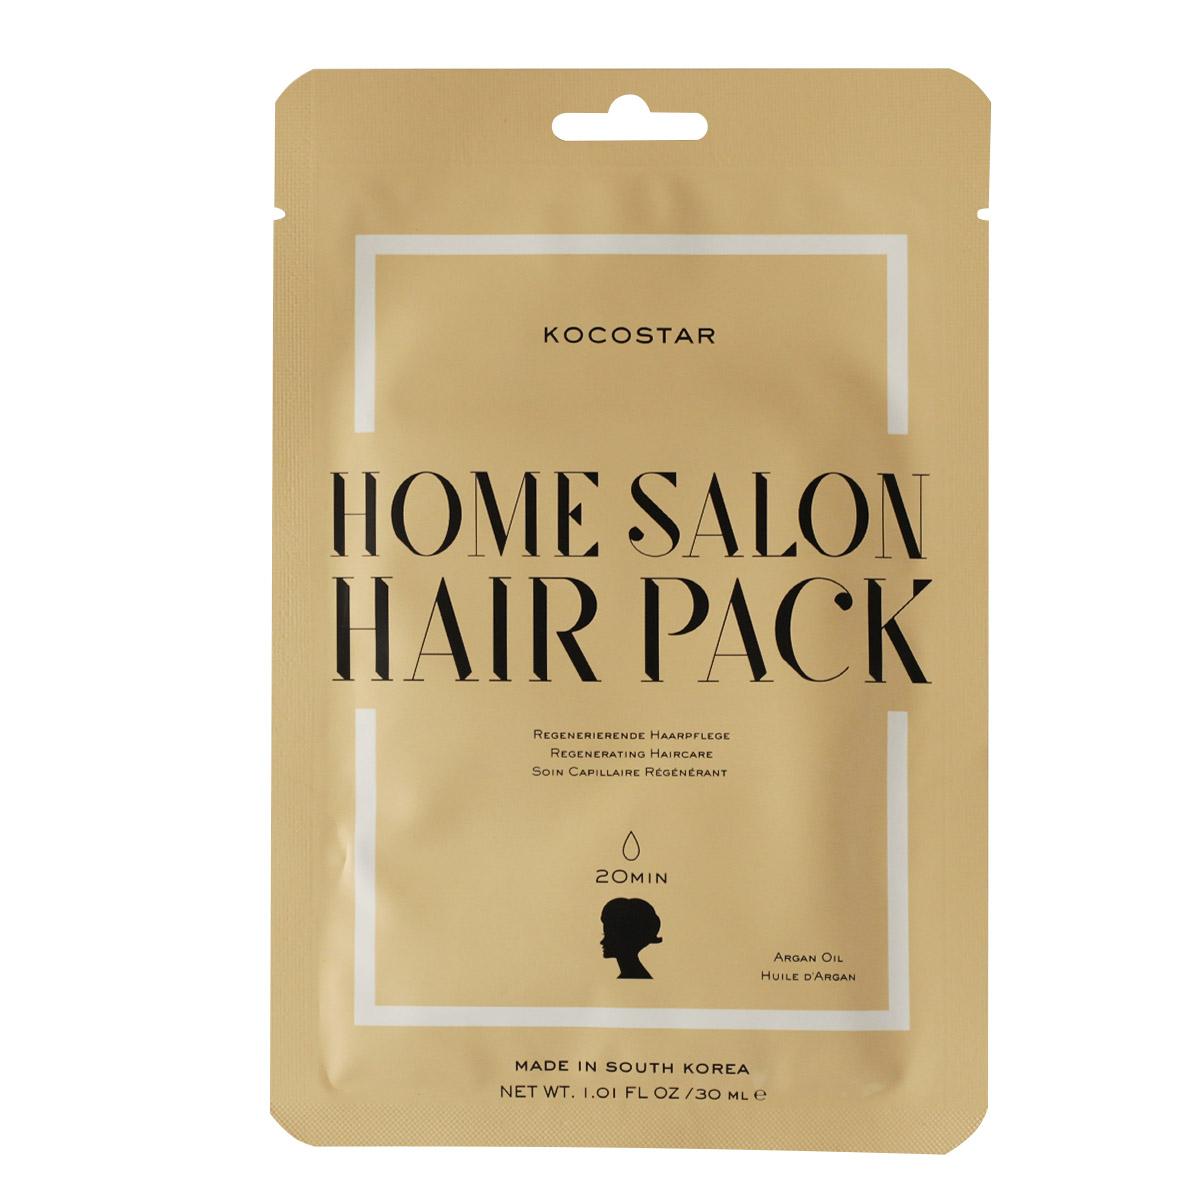 Kocostar Home Salon Hair Pack 30 ml 91536